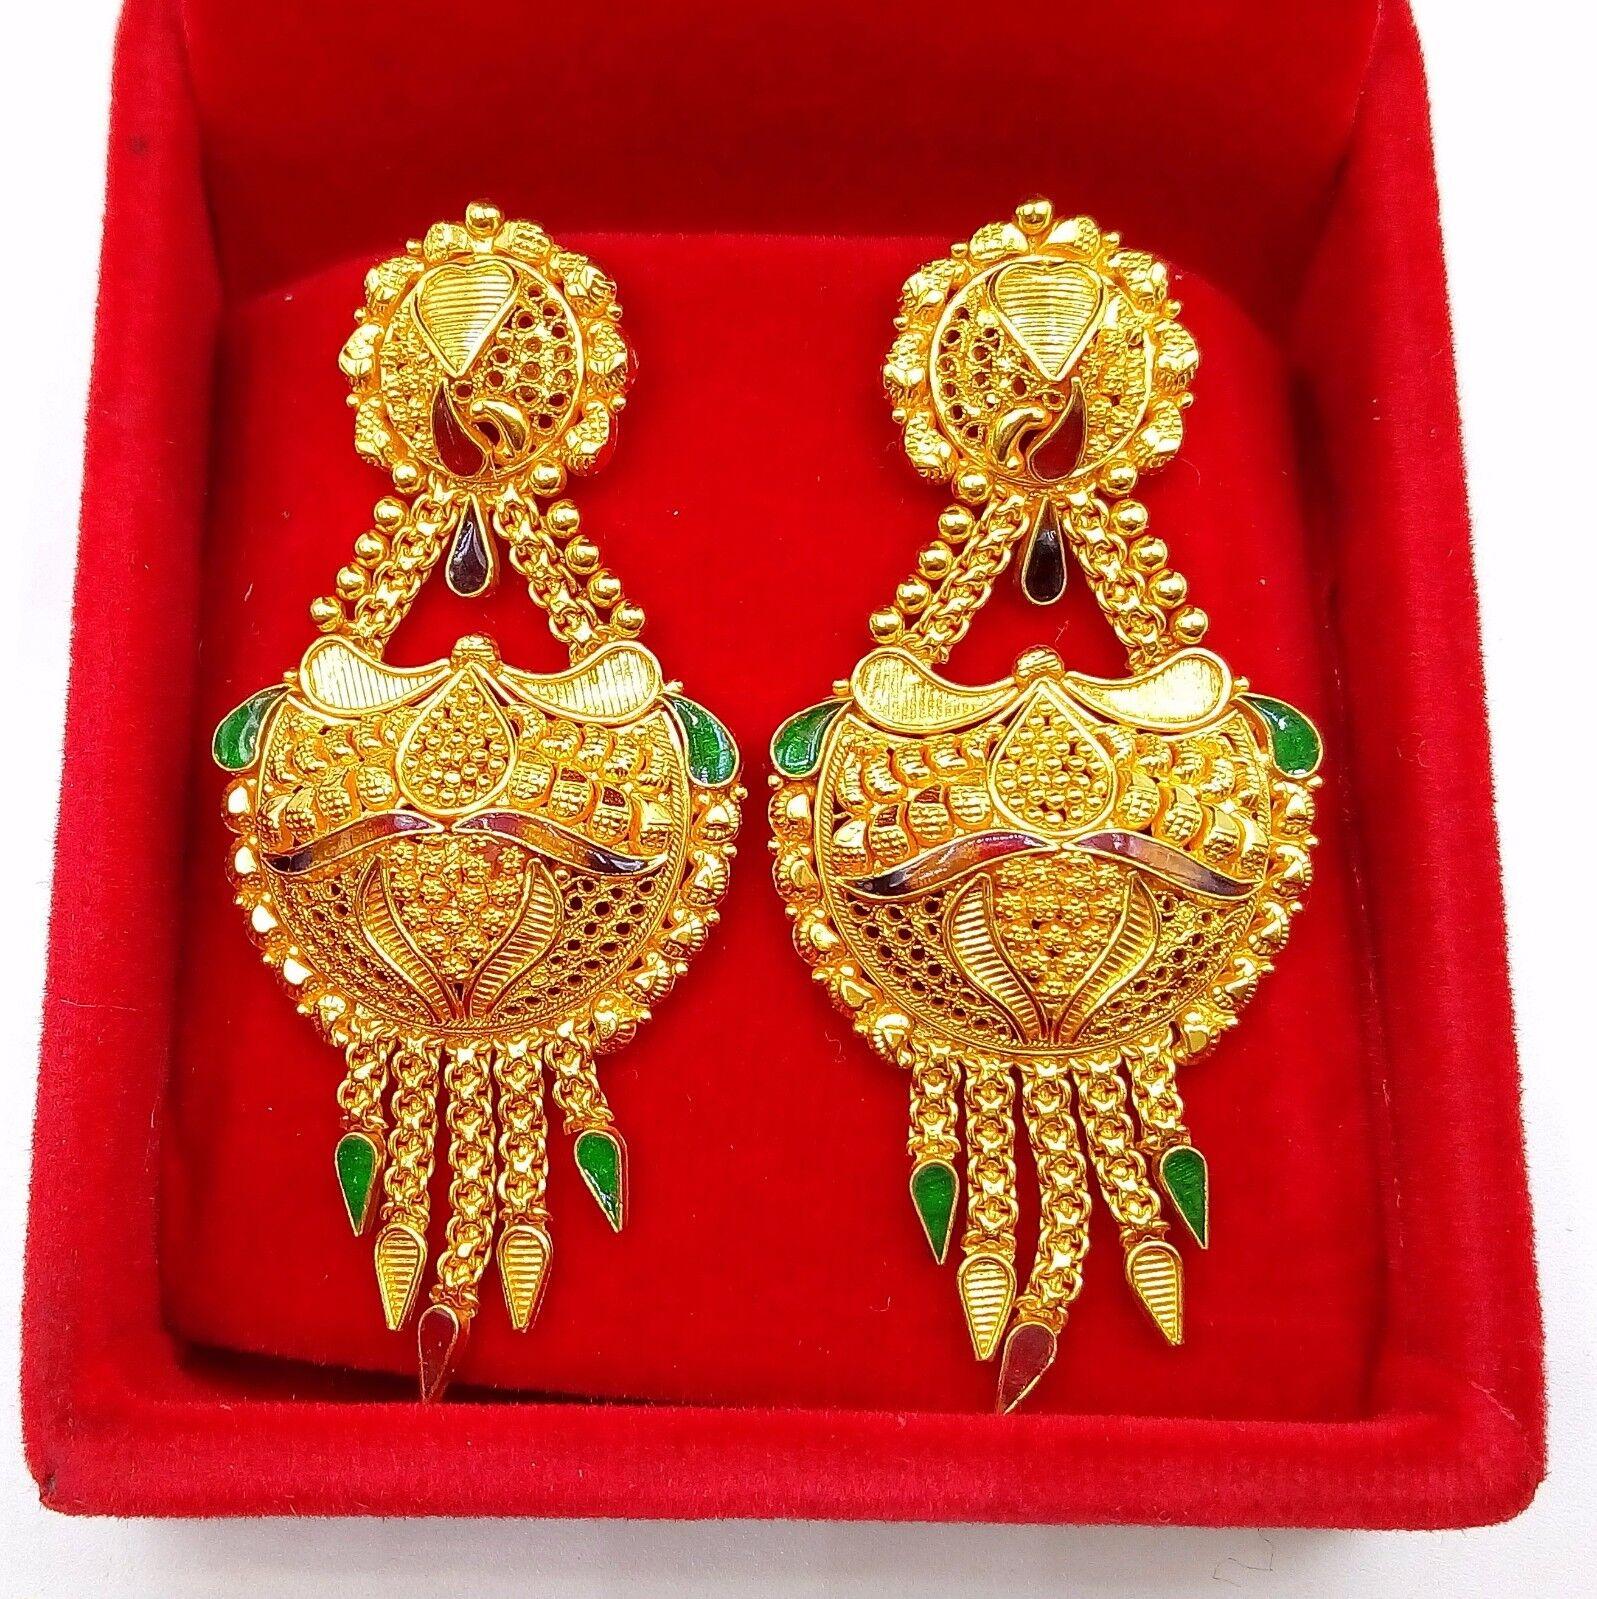 gold EARRING PAIR 22K JEWELRY TRADITIONAL WEDDING FILIGREE NICE JEWELRY RAJ